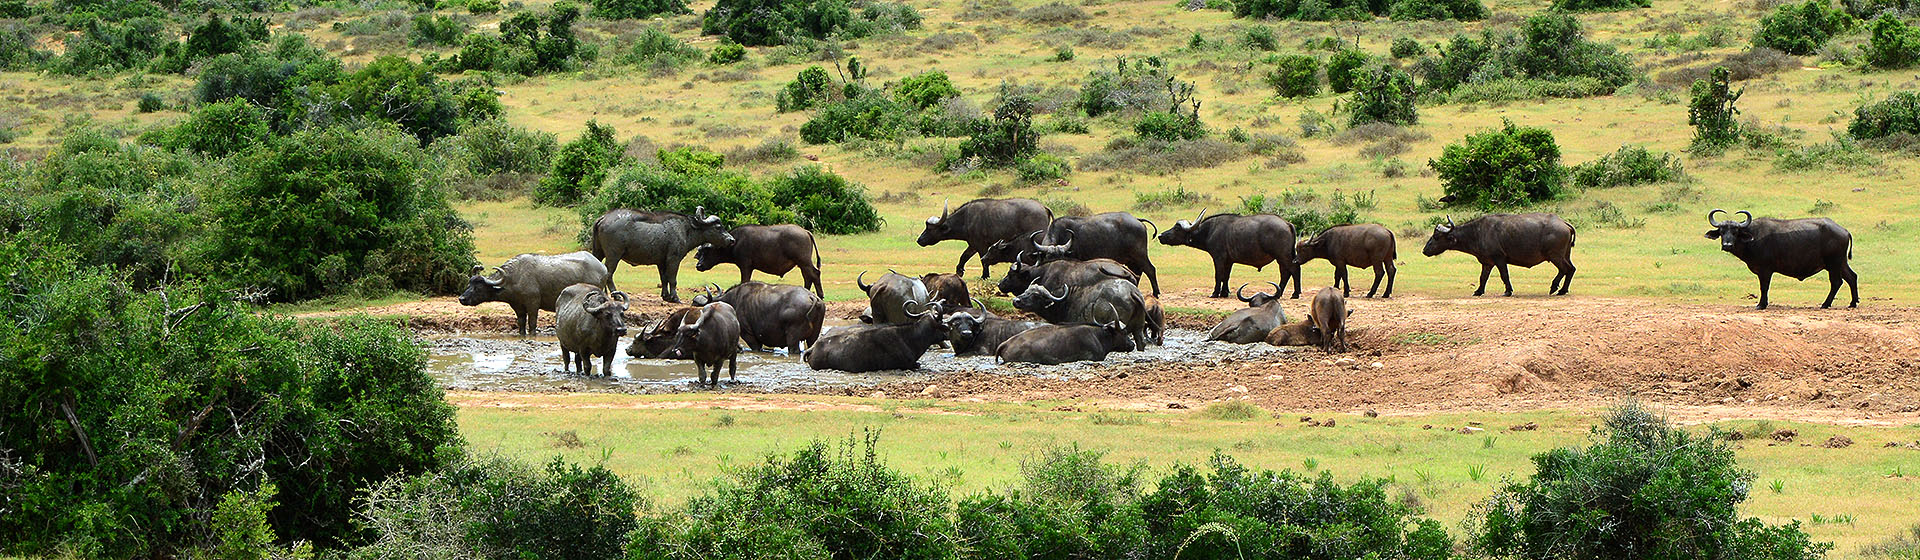 Cape Buffalo - Addo Elephant Park